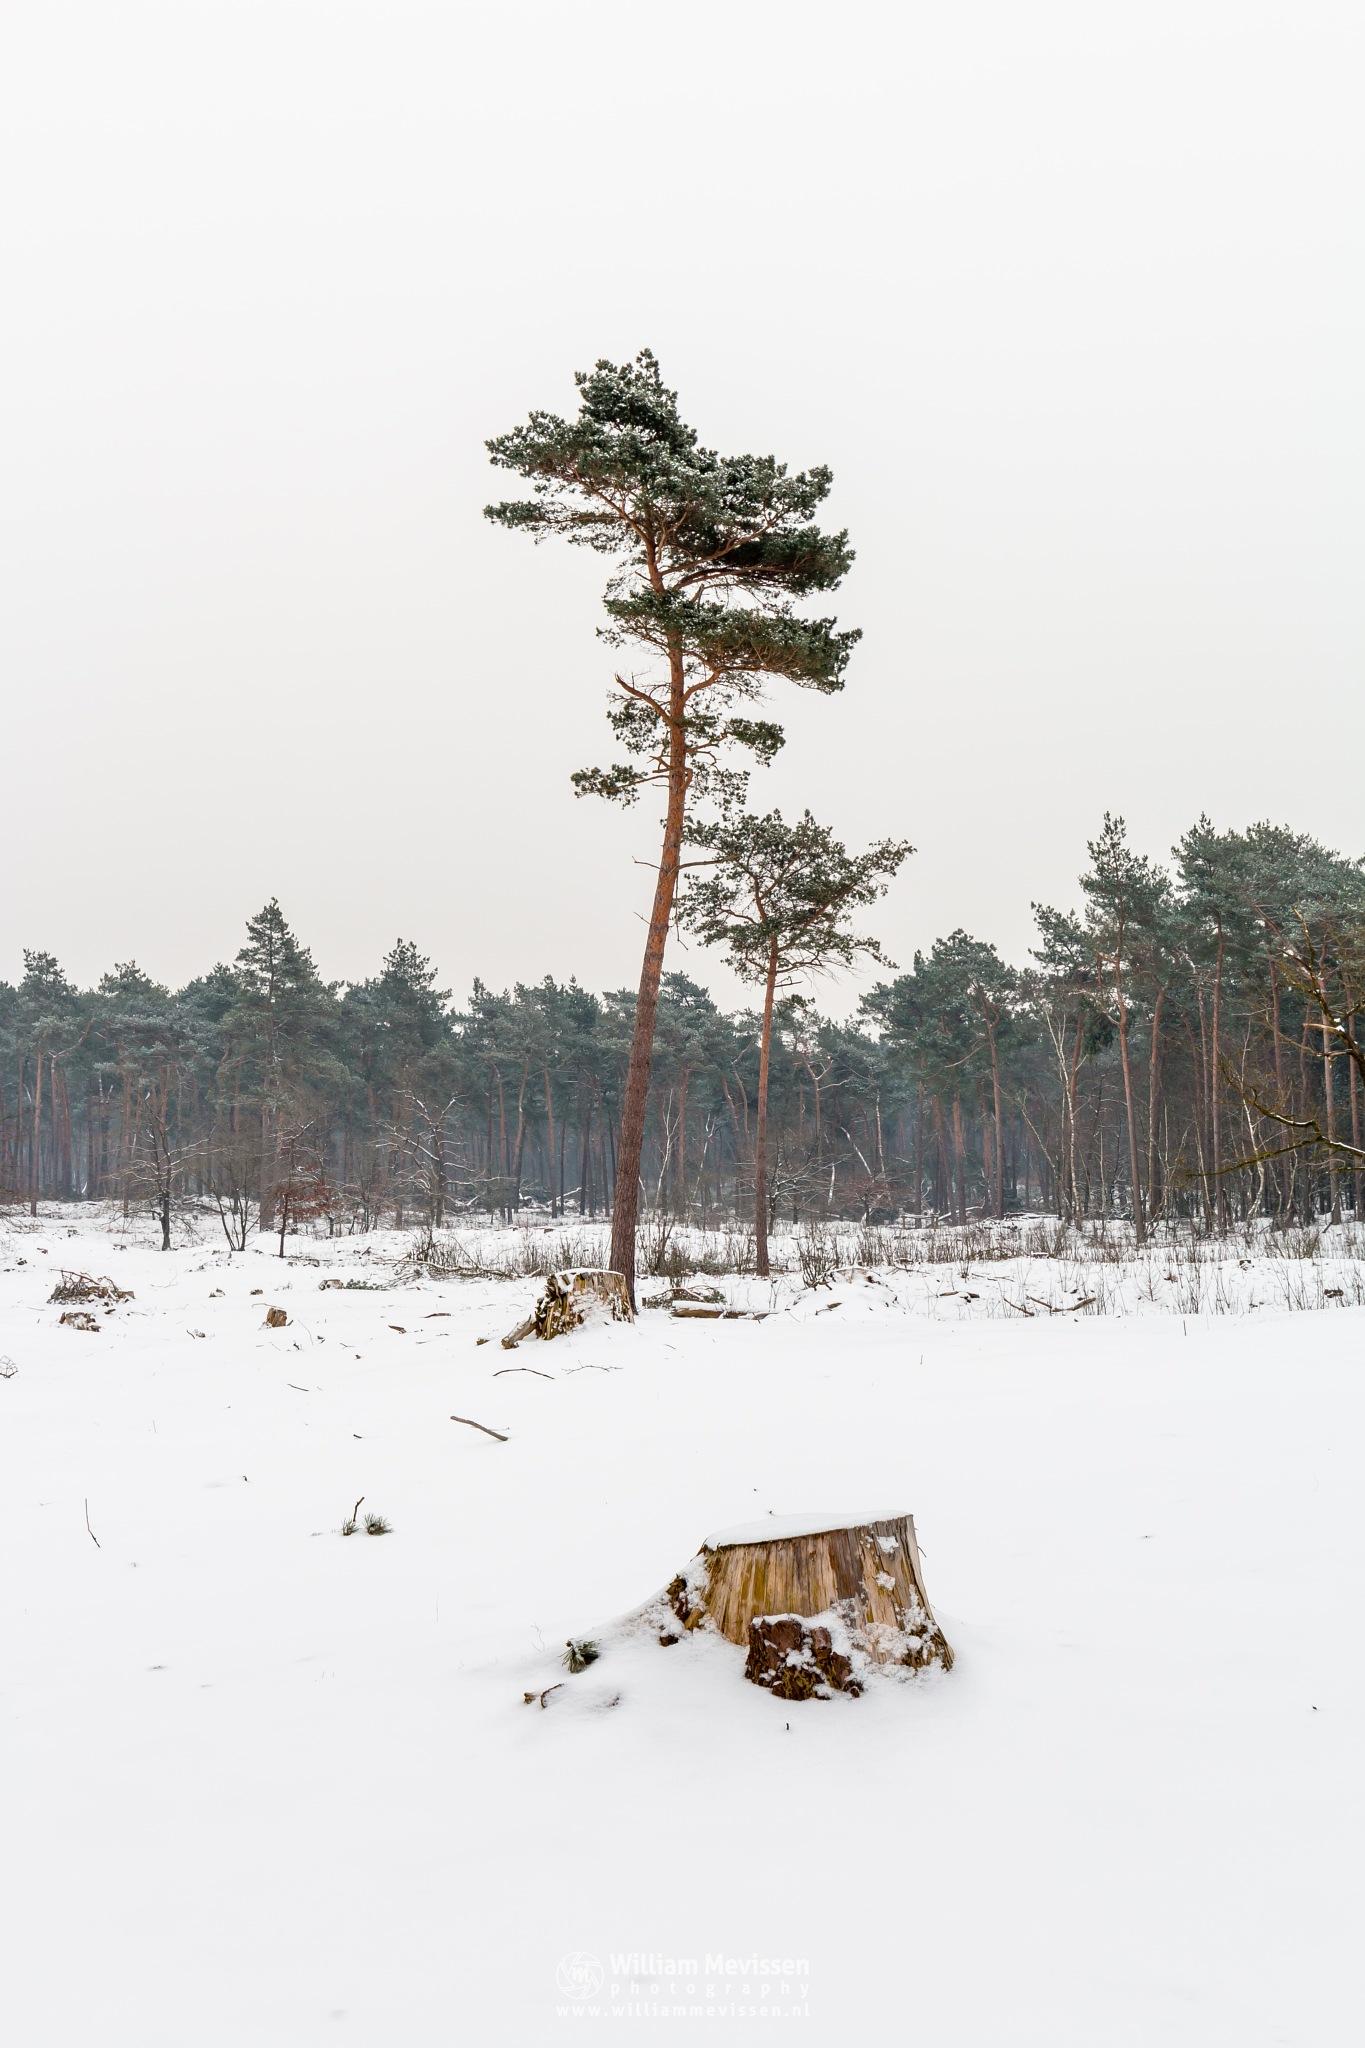 Photo in Landscape #boshuizerbergen #boschhuizerbergen #venray #nature #limburg #netherlands #forest #snow #winterlandscape #trunks #trunk #tree #trees #winter #noord-limburg